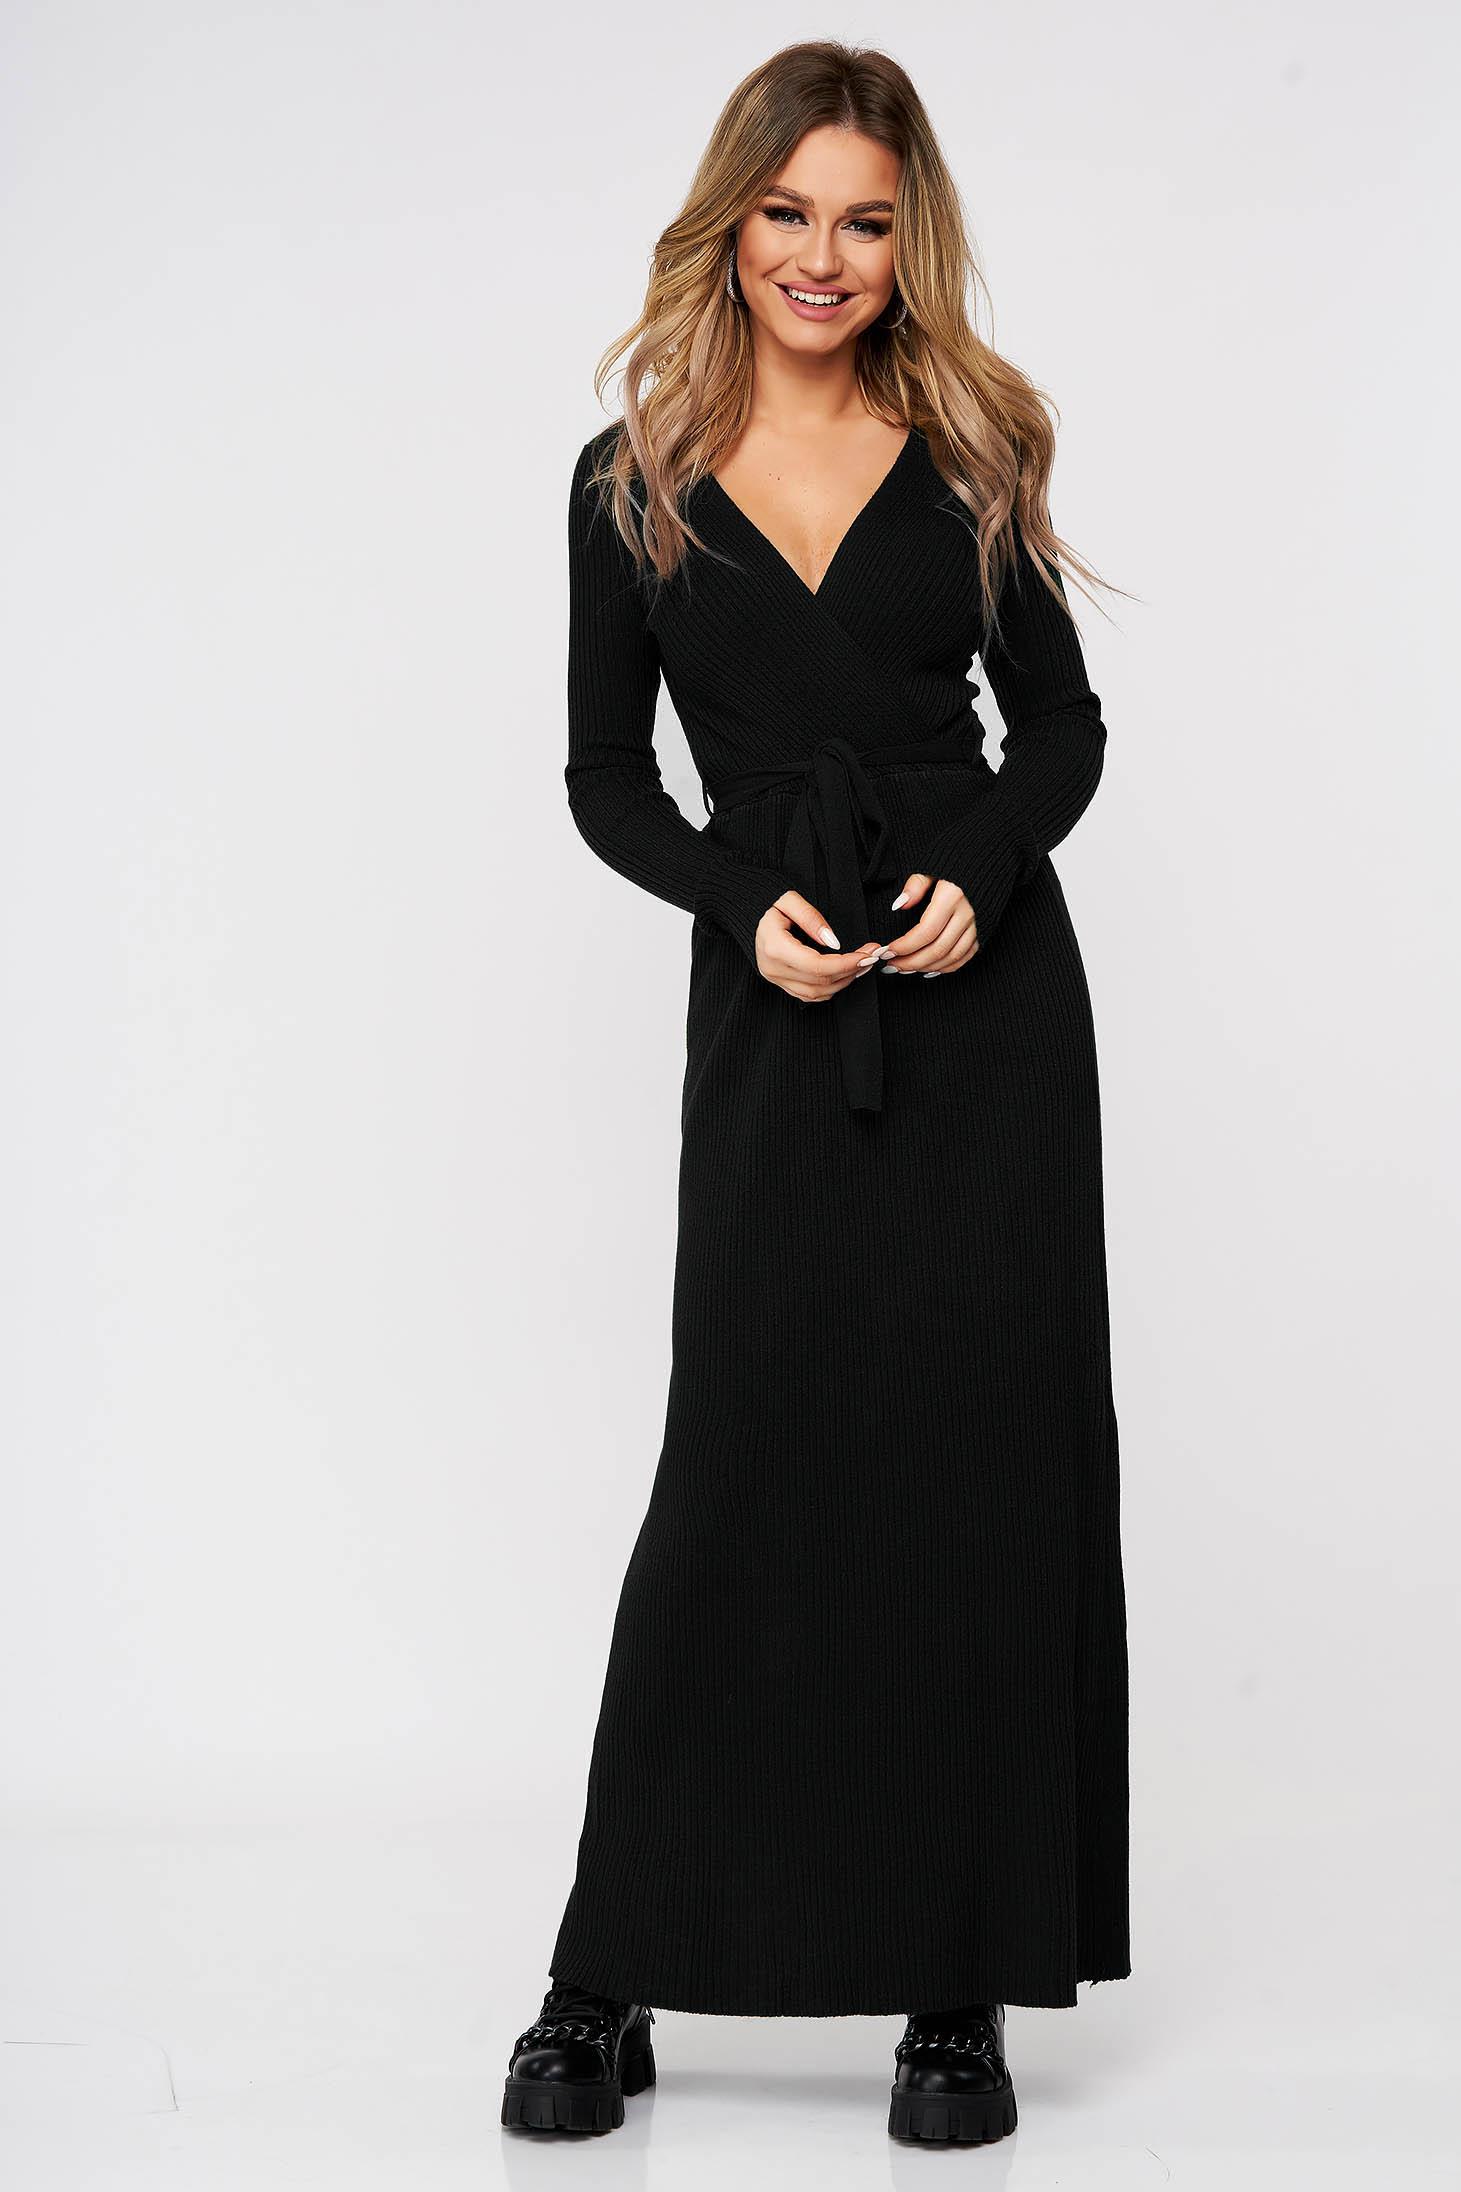 Rochie SunShine casual neagra tricotata accesorizata cu cordon din material reiat elastic si fin